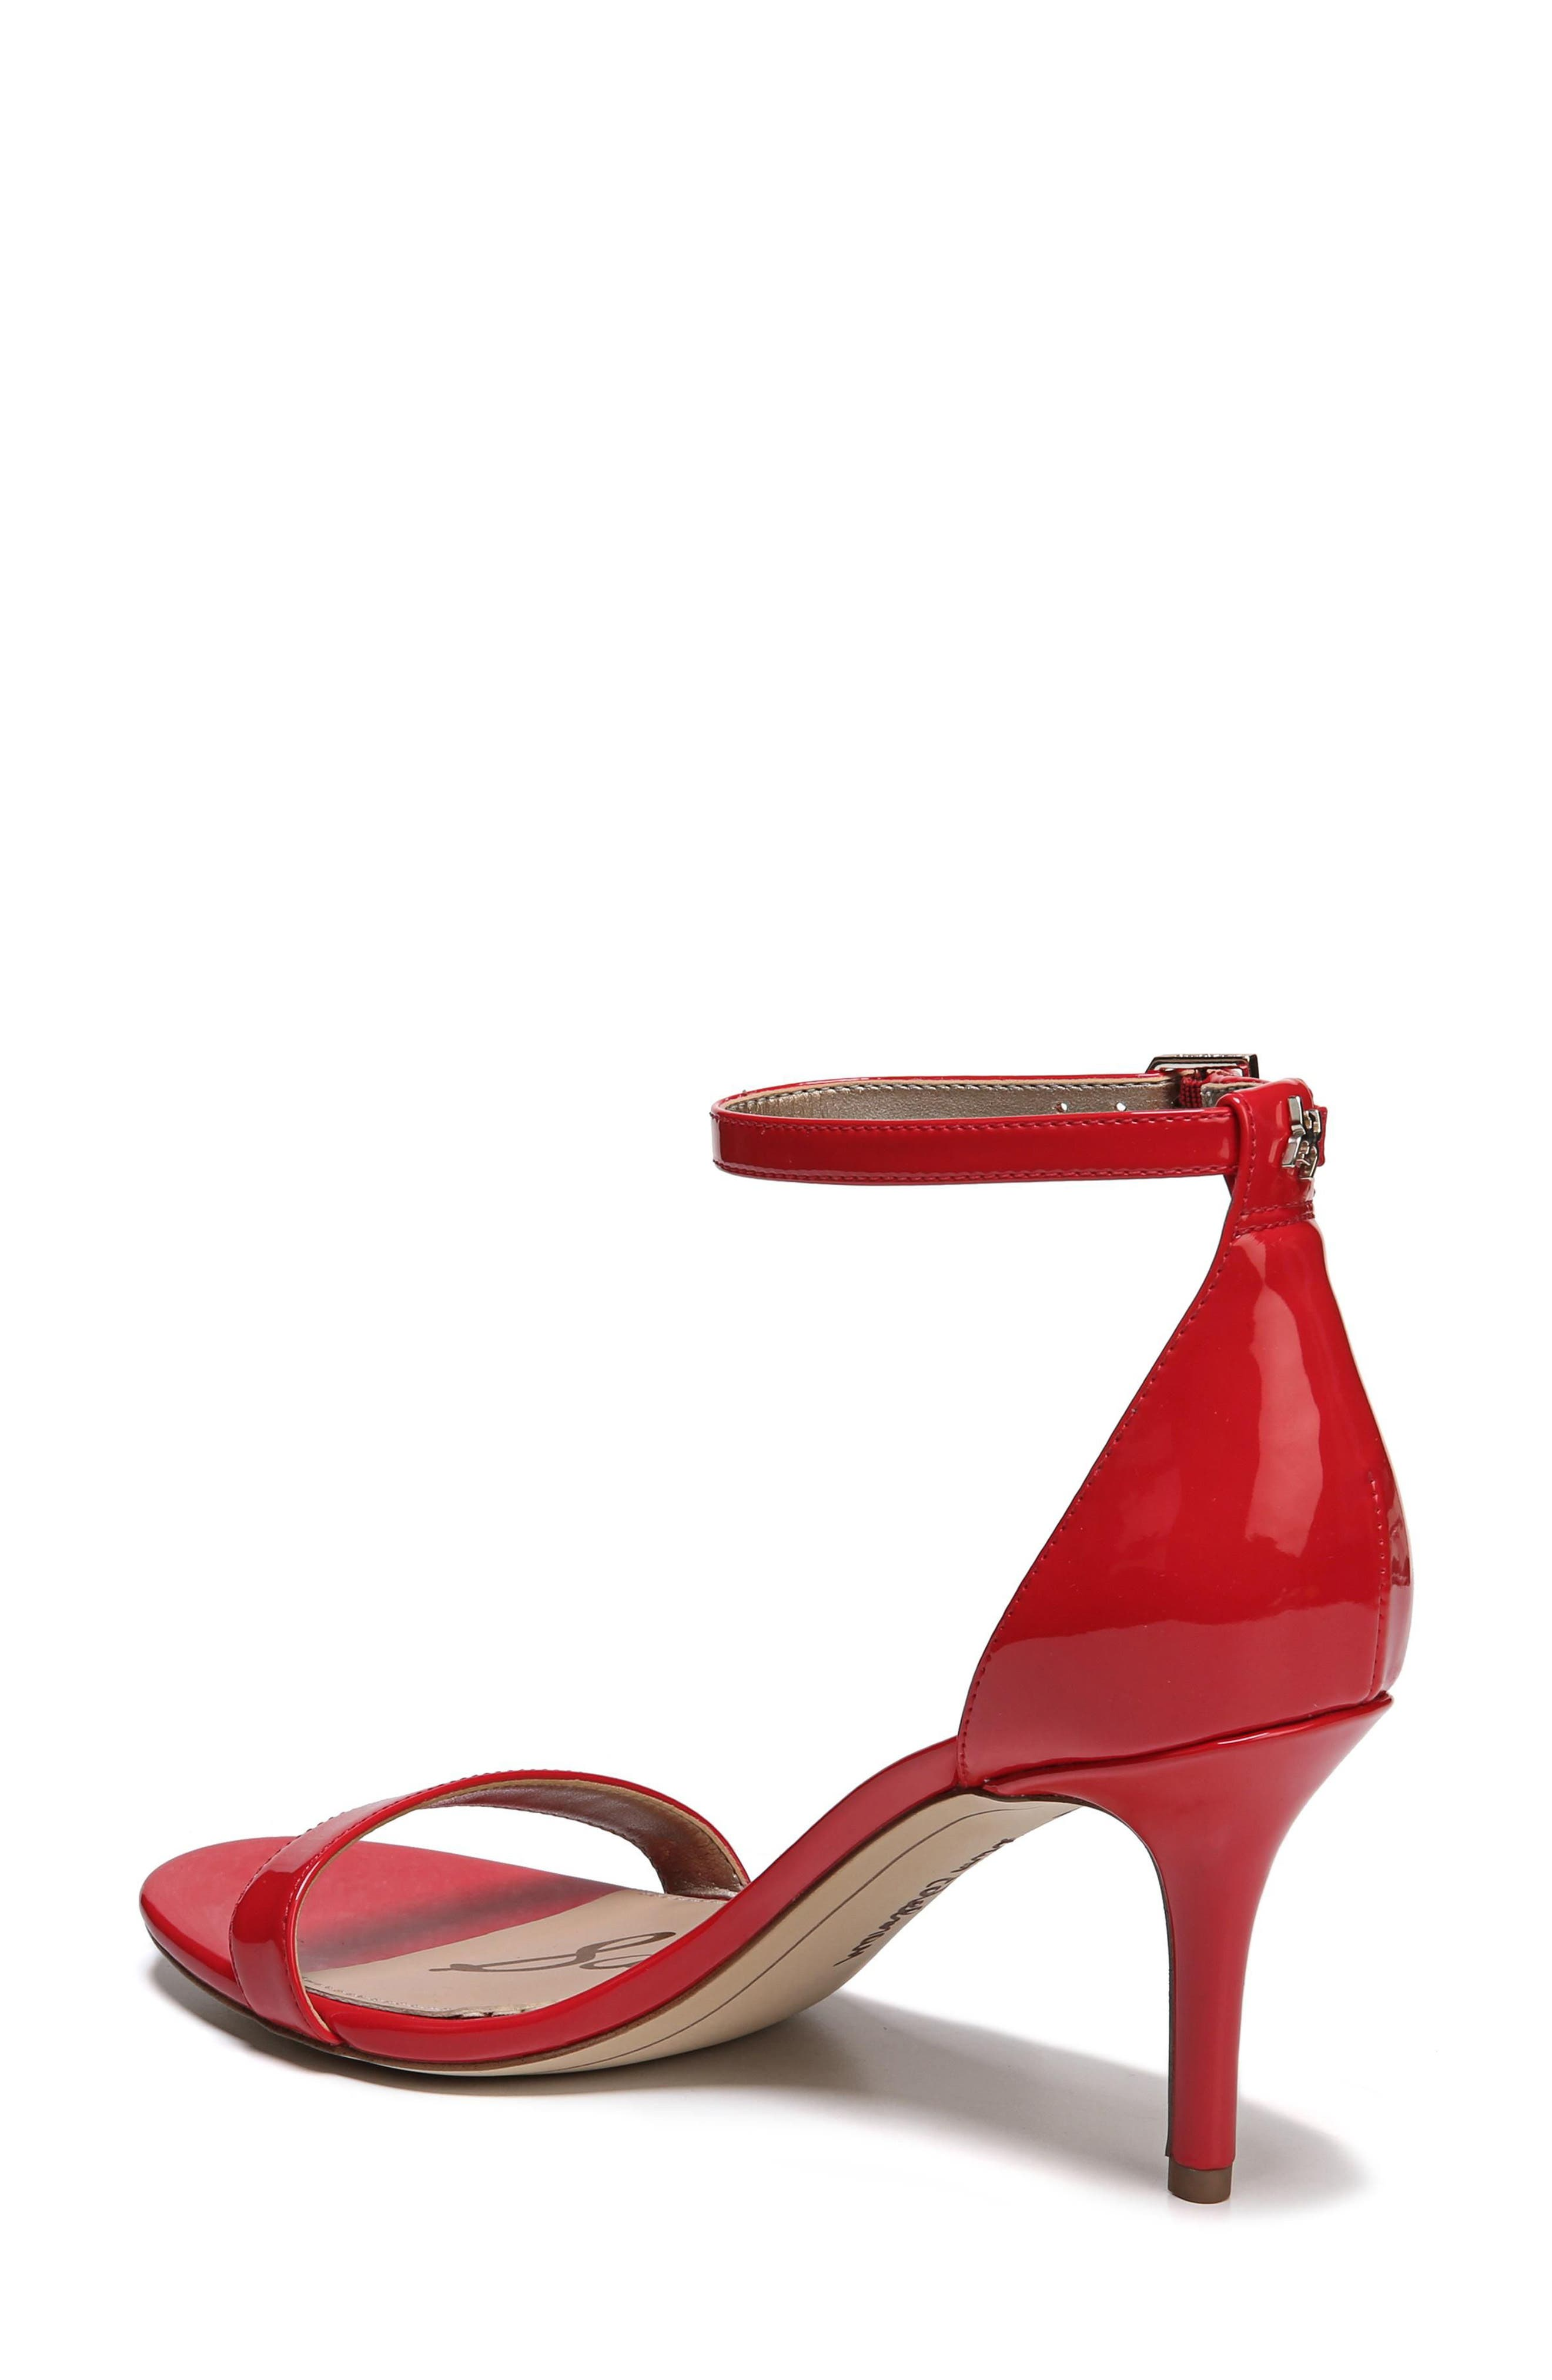 ,                             'Patti' Ankle Strap Sandal,                             Alternate thumbnail 115, color,                             606